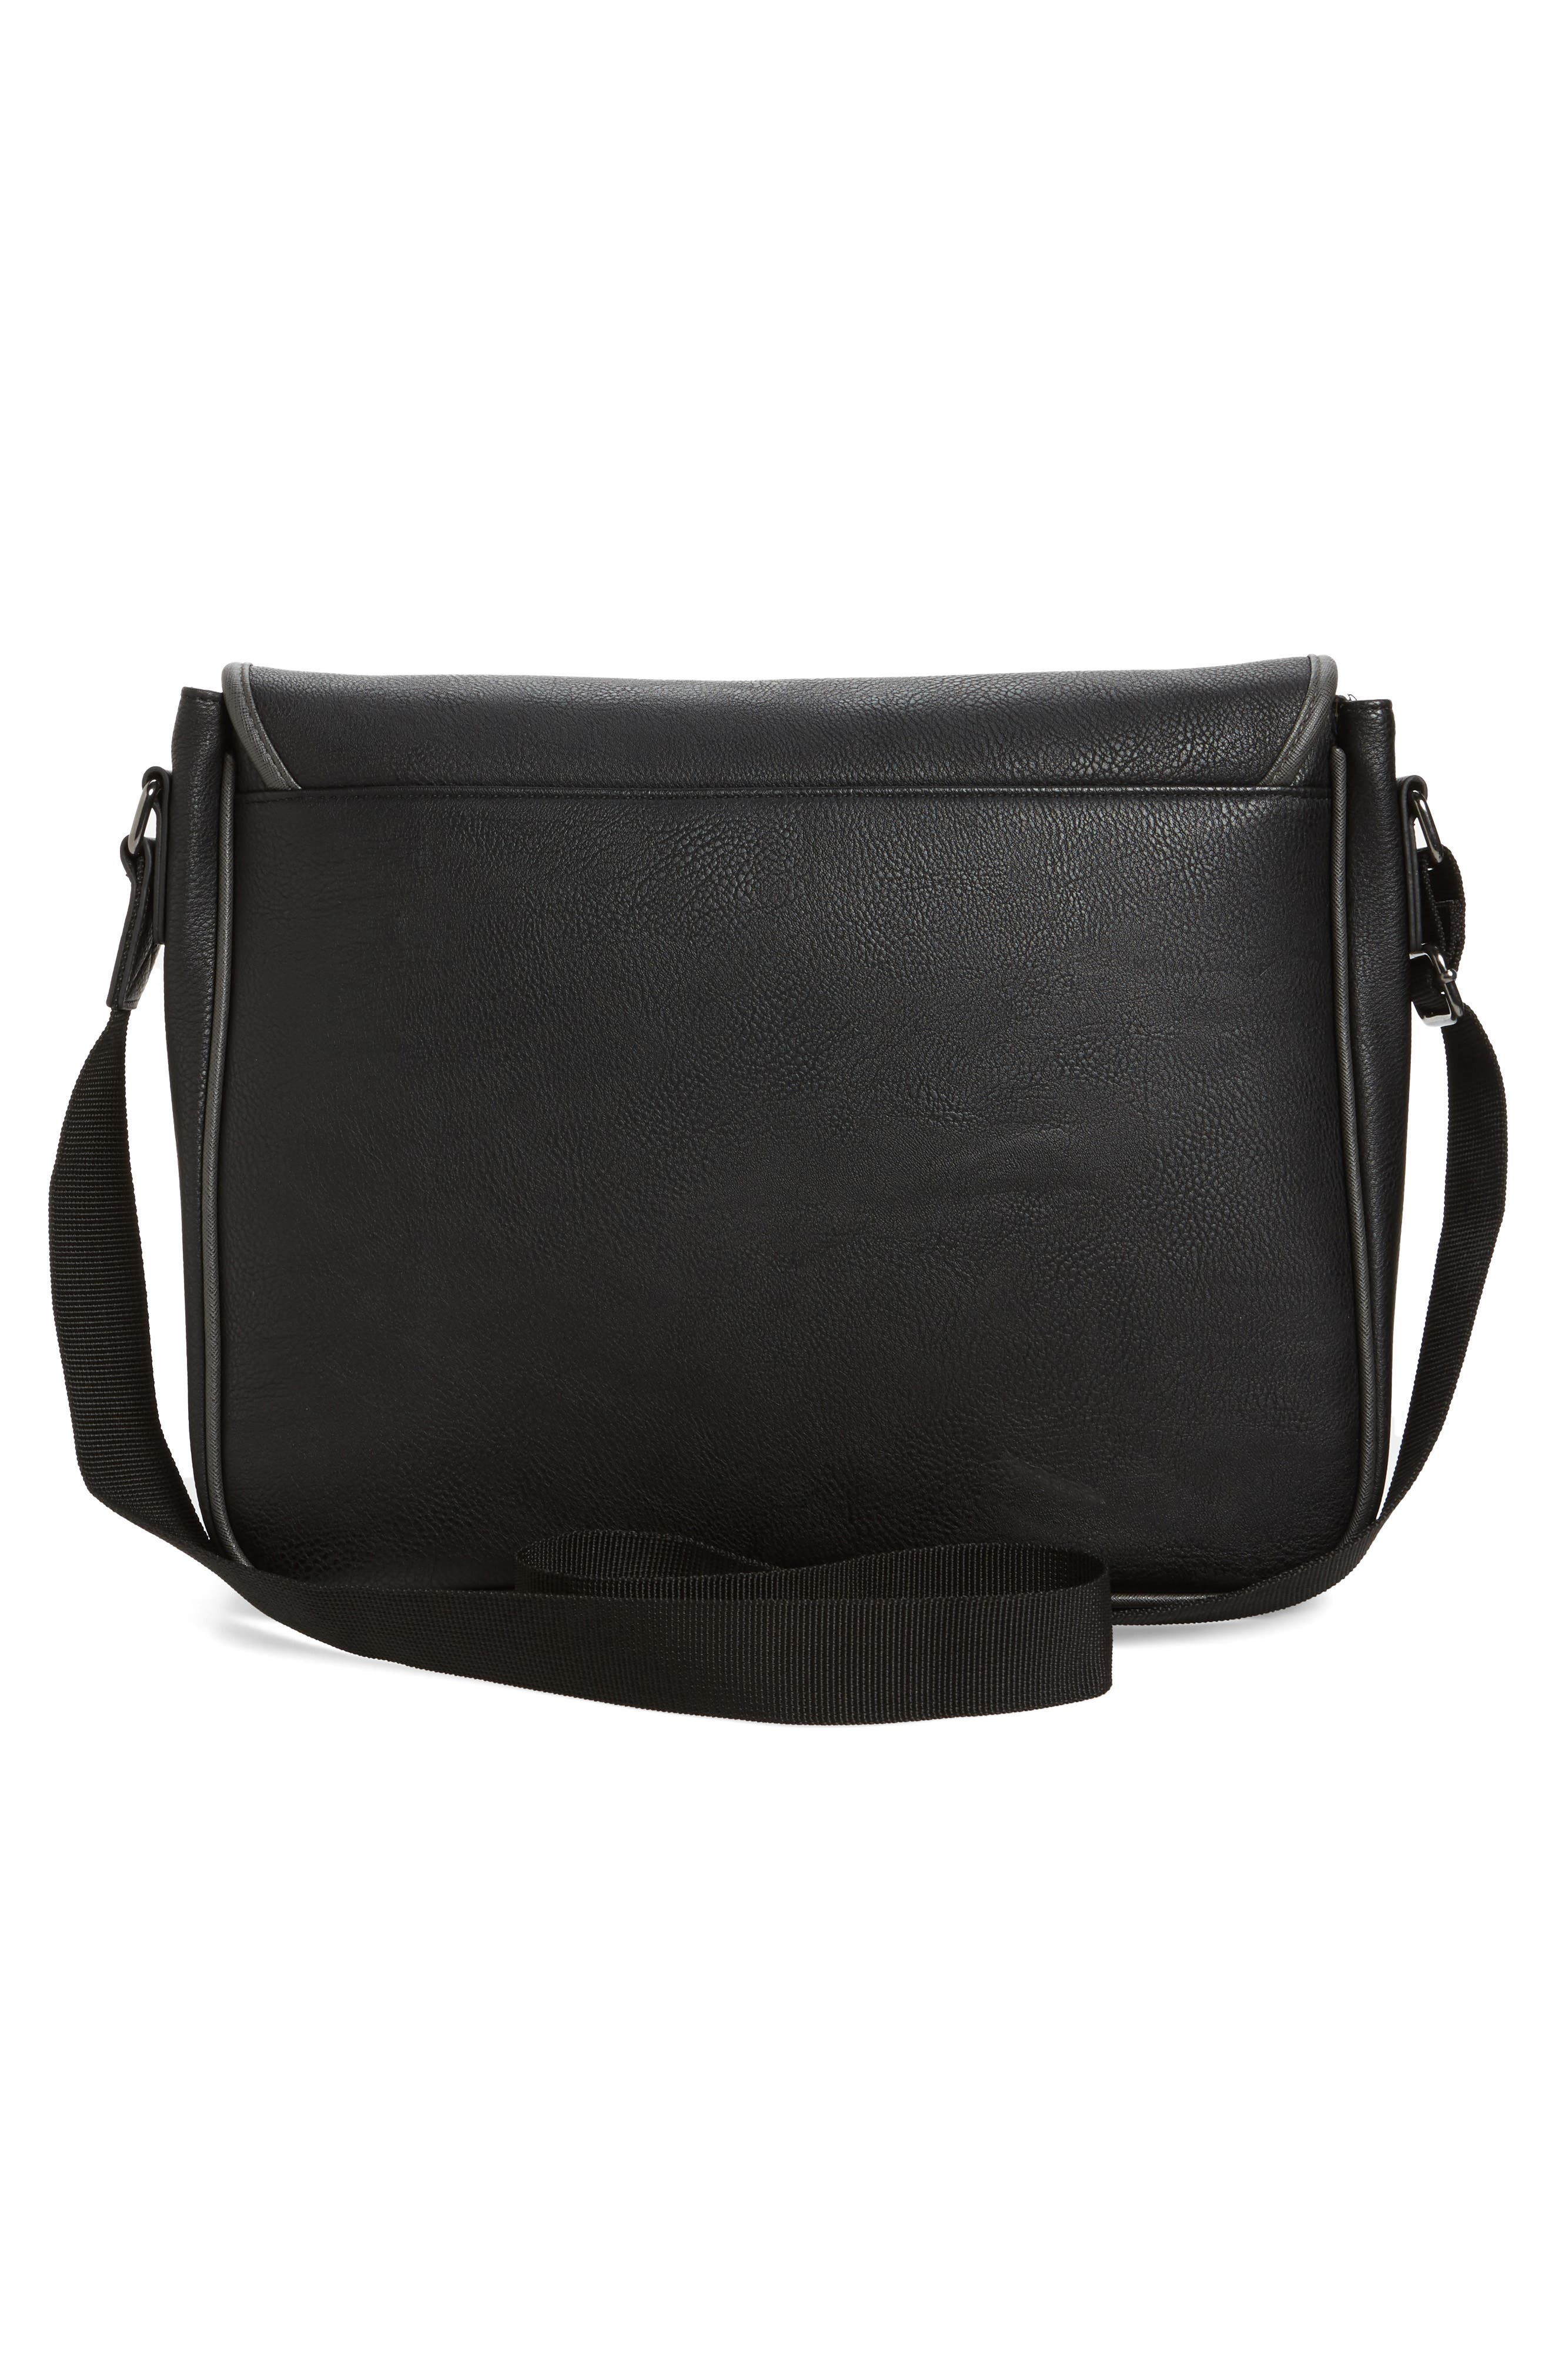 Buzard Messenger Bag,                             Alternate thumbnail 3, color,                             Black